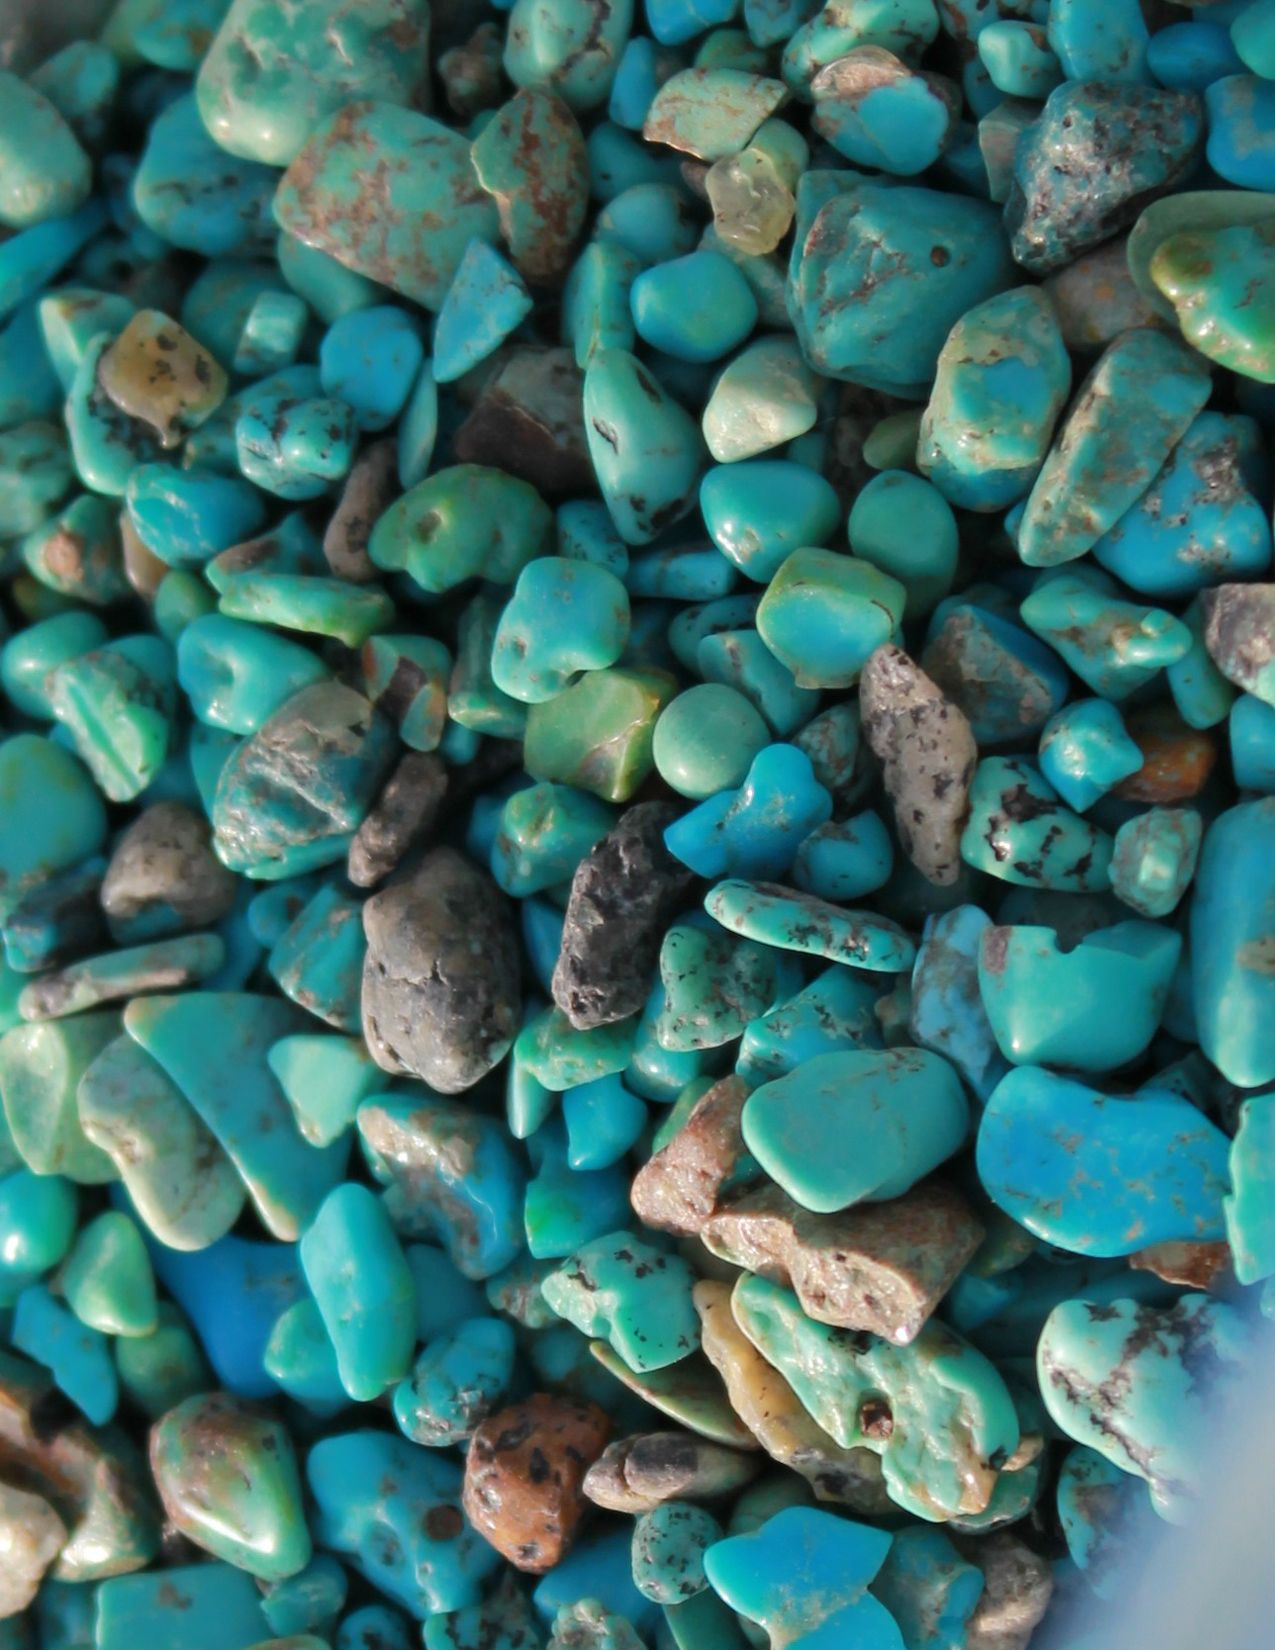 turquoise steine in t rkis blau gr n t rkis t rkis farbe blau und blau gr n. Black Bedroom Furniture Sets. Home Design Ideas